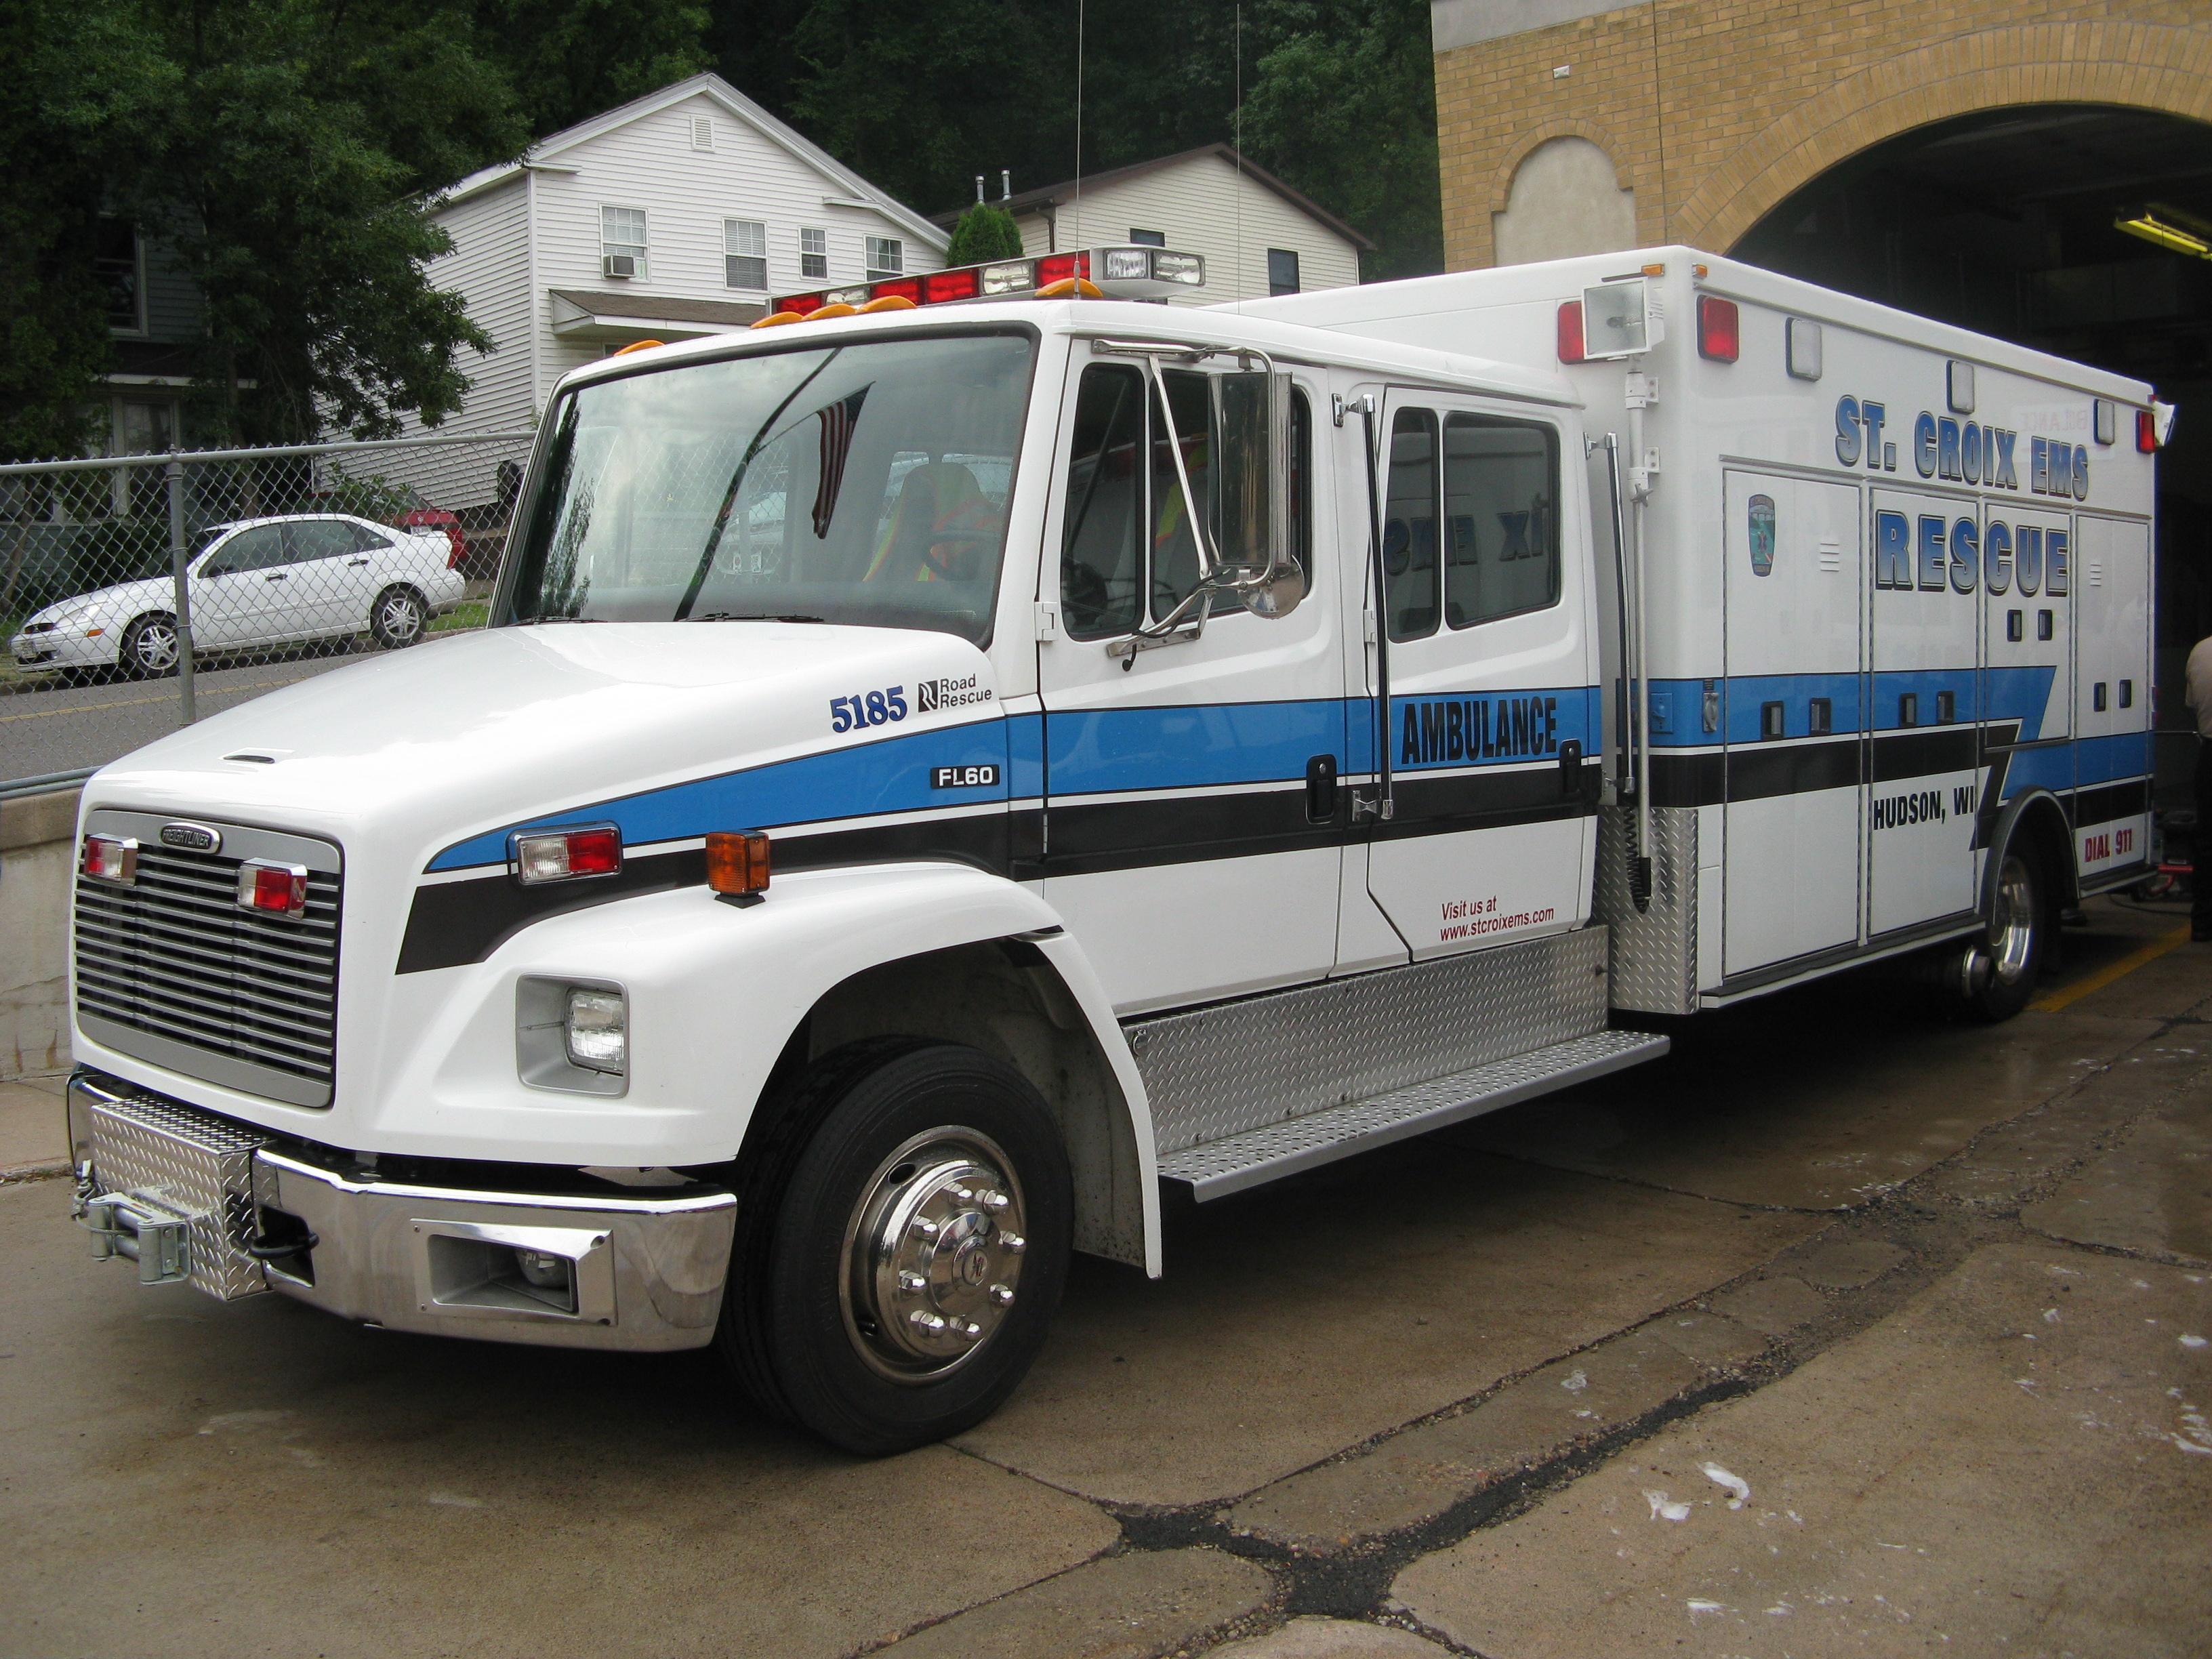 File St Croix Ems Rescue Ambulance 5185 Jpg Wikipedia